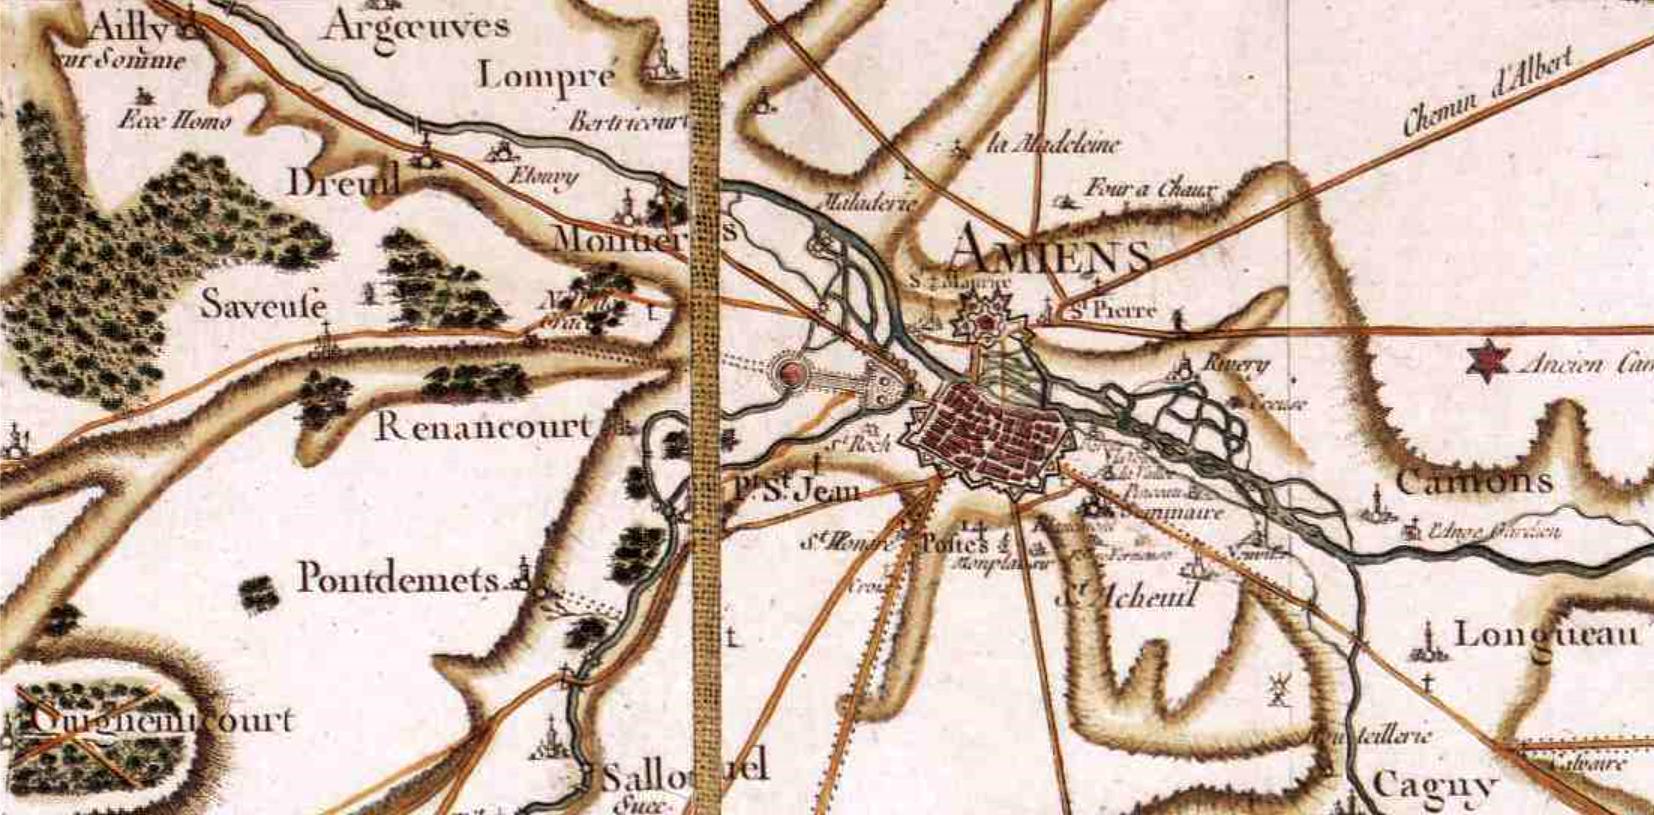 Amiens somme cassini